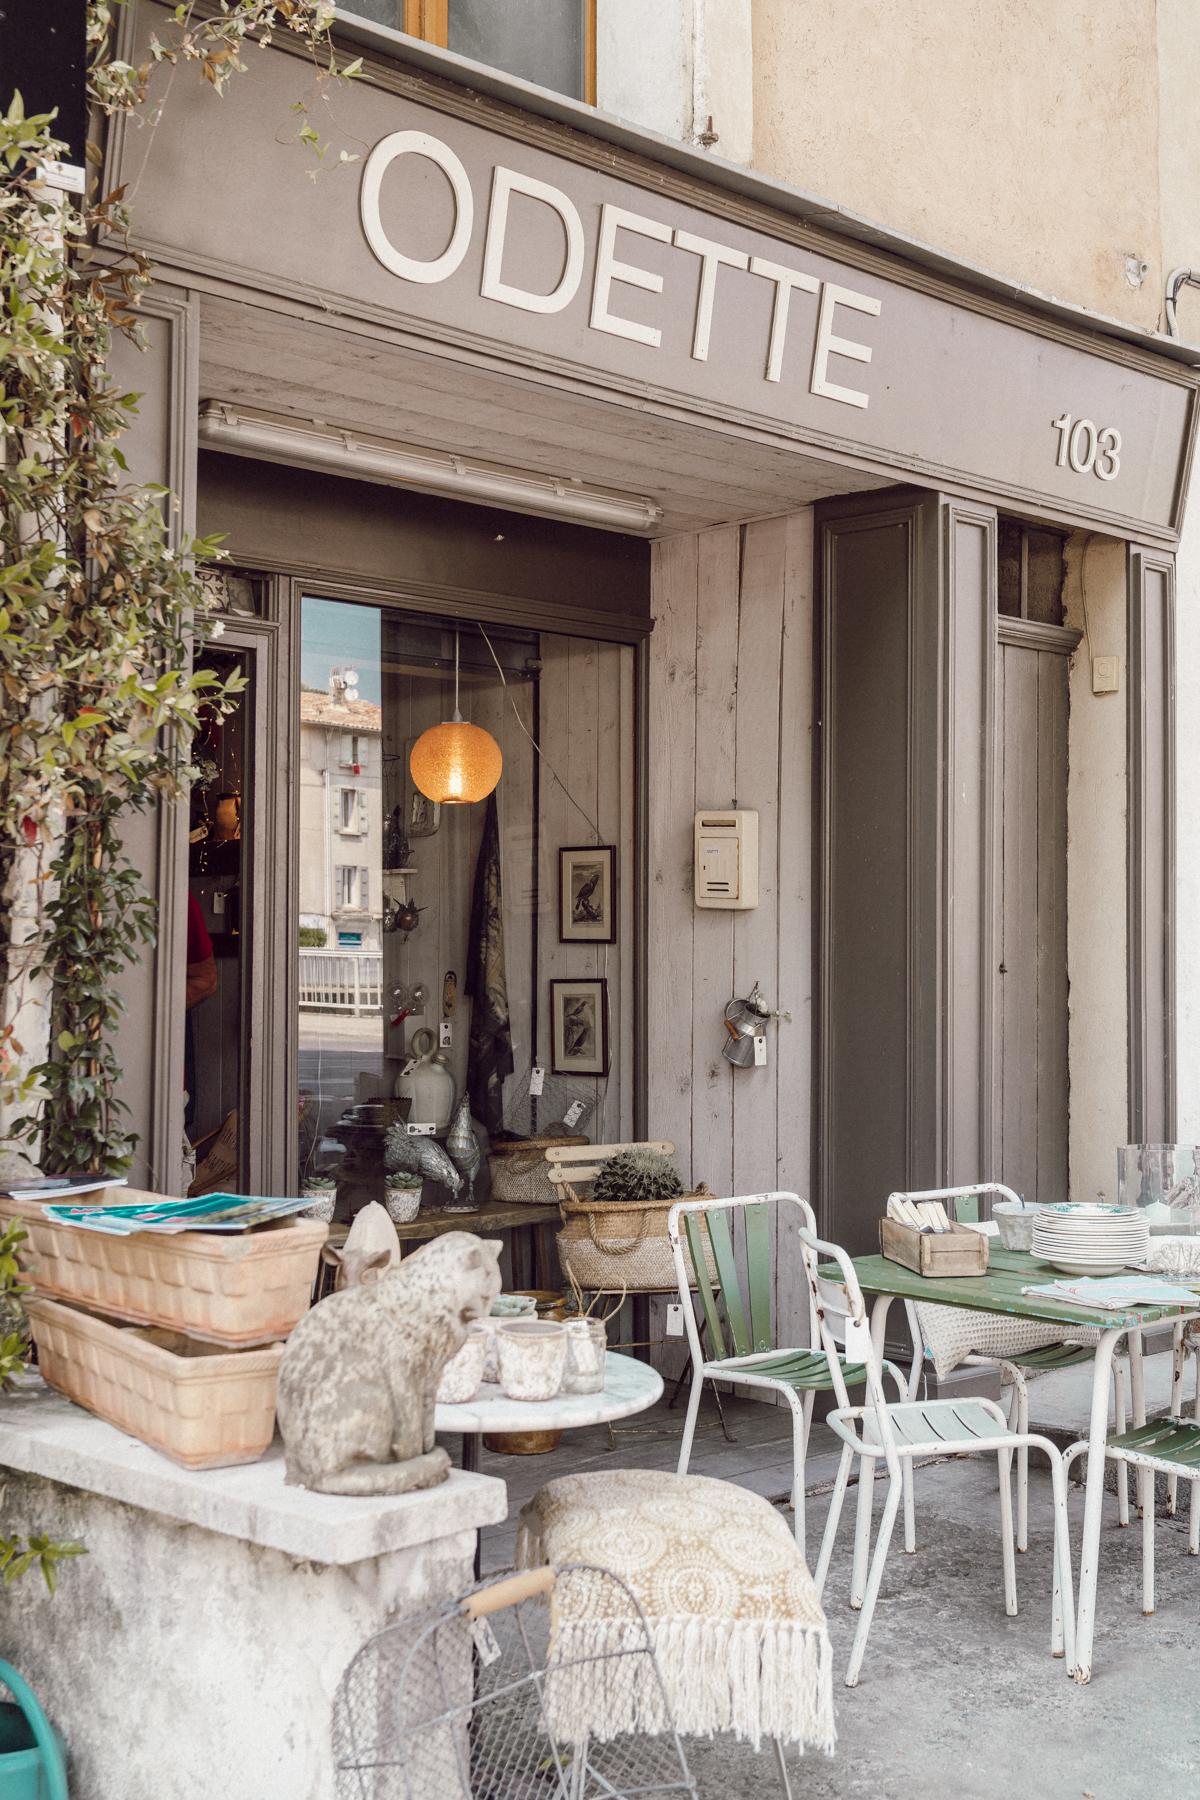 provence-2-bonnieux-apt-lourmarin-28